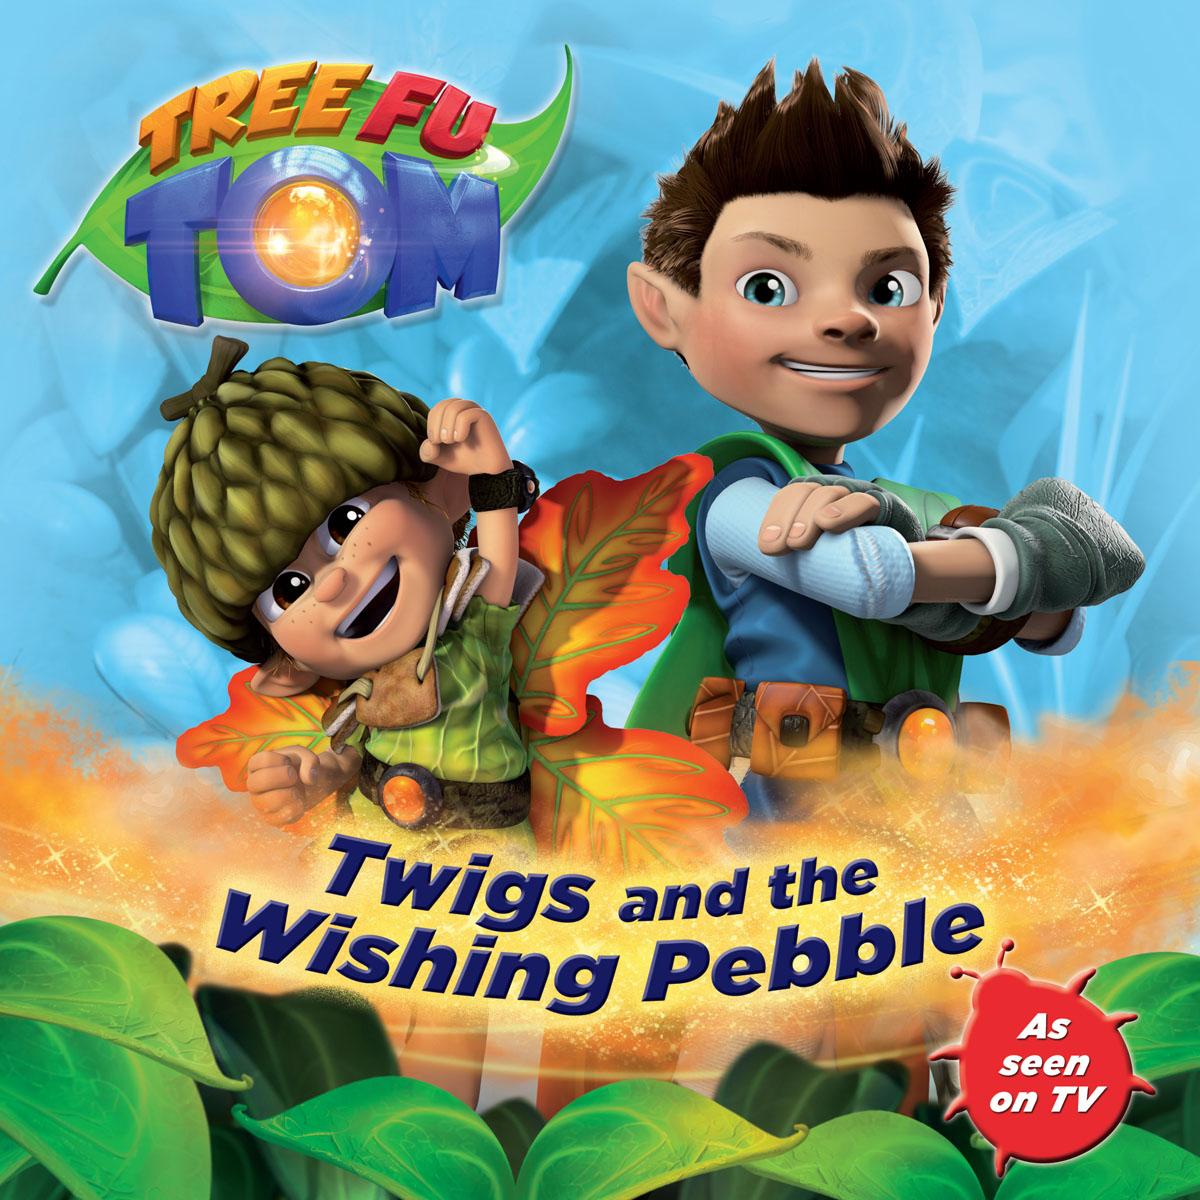 Купить Tree Fu Tom: Twigs and the Wishing Pebble,